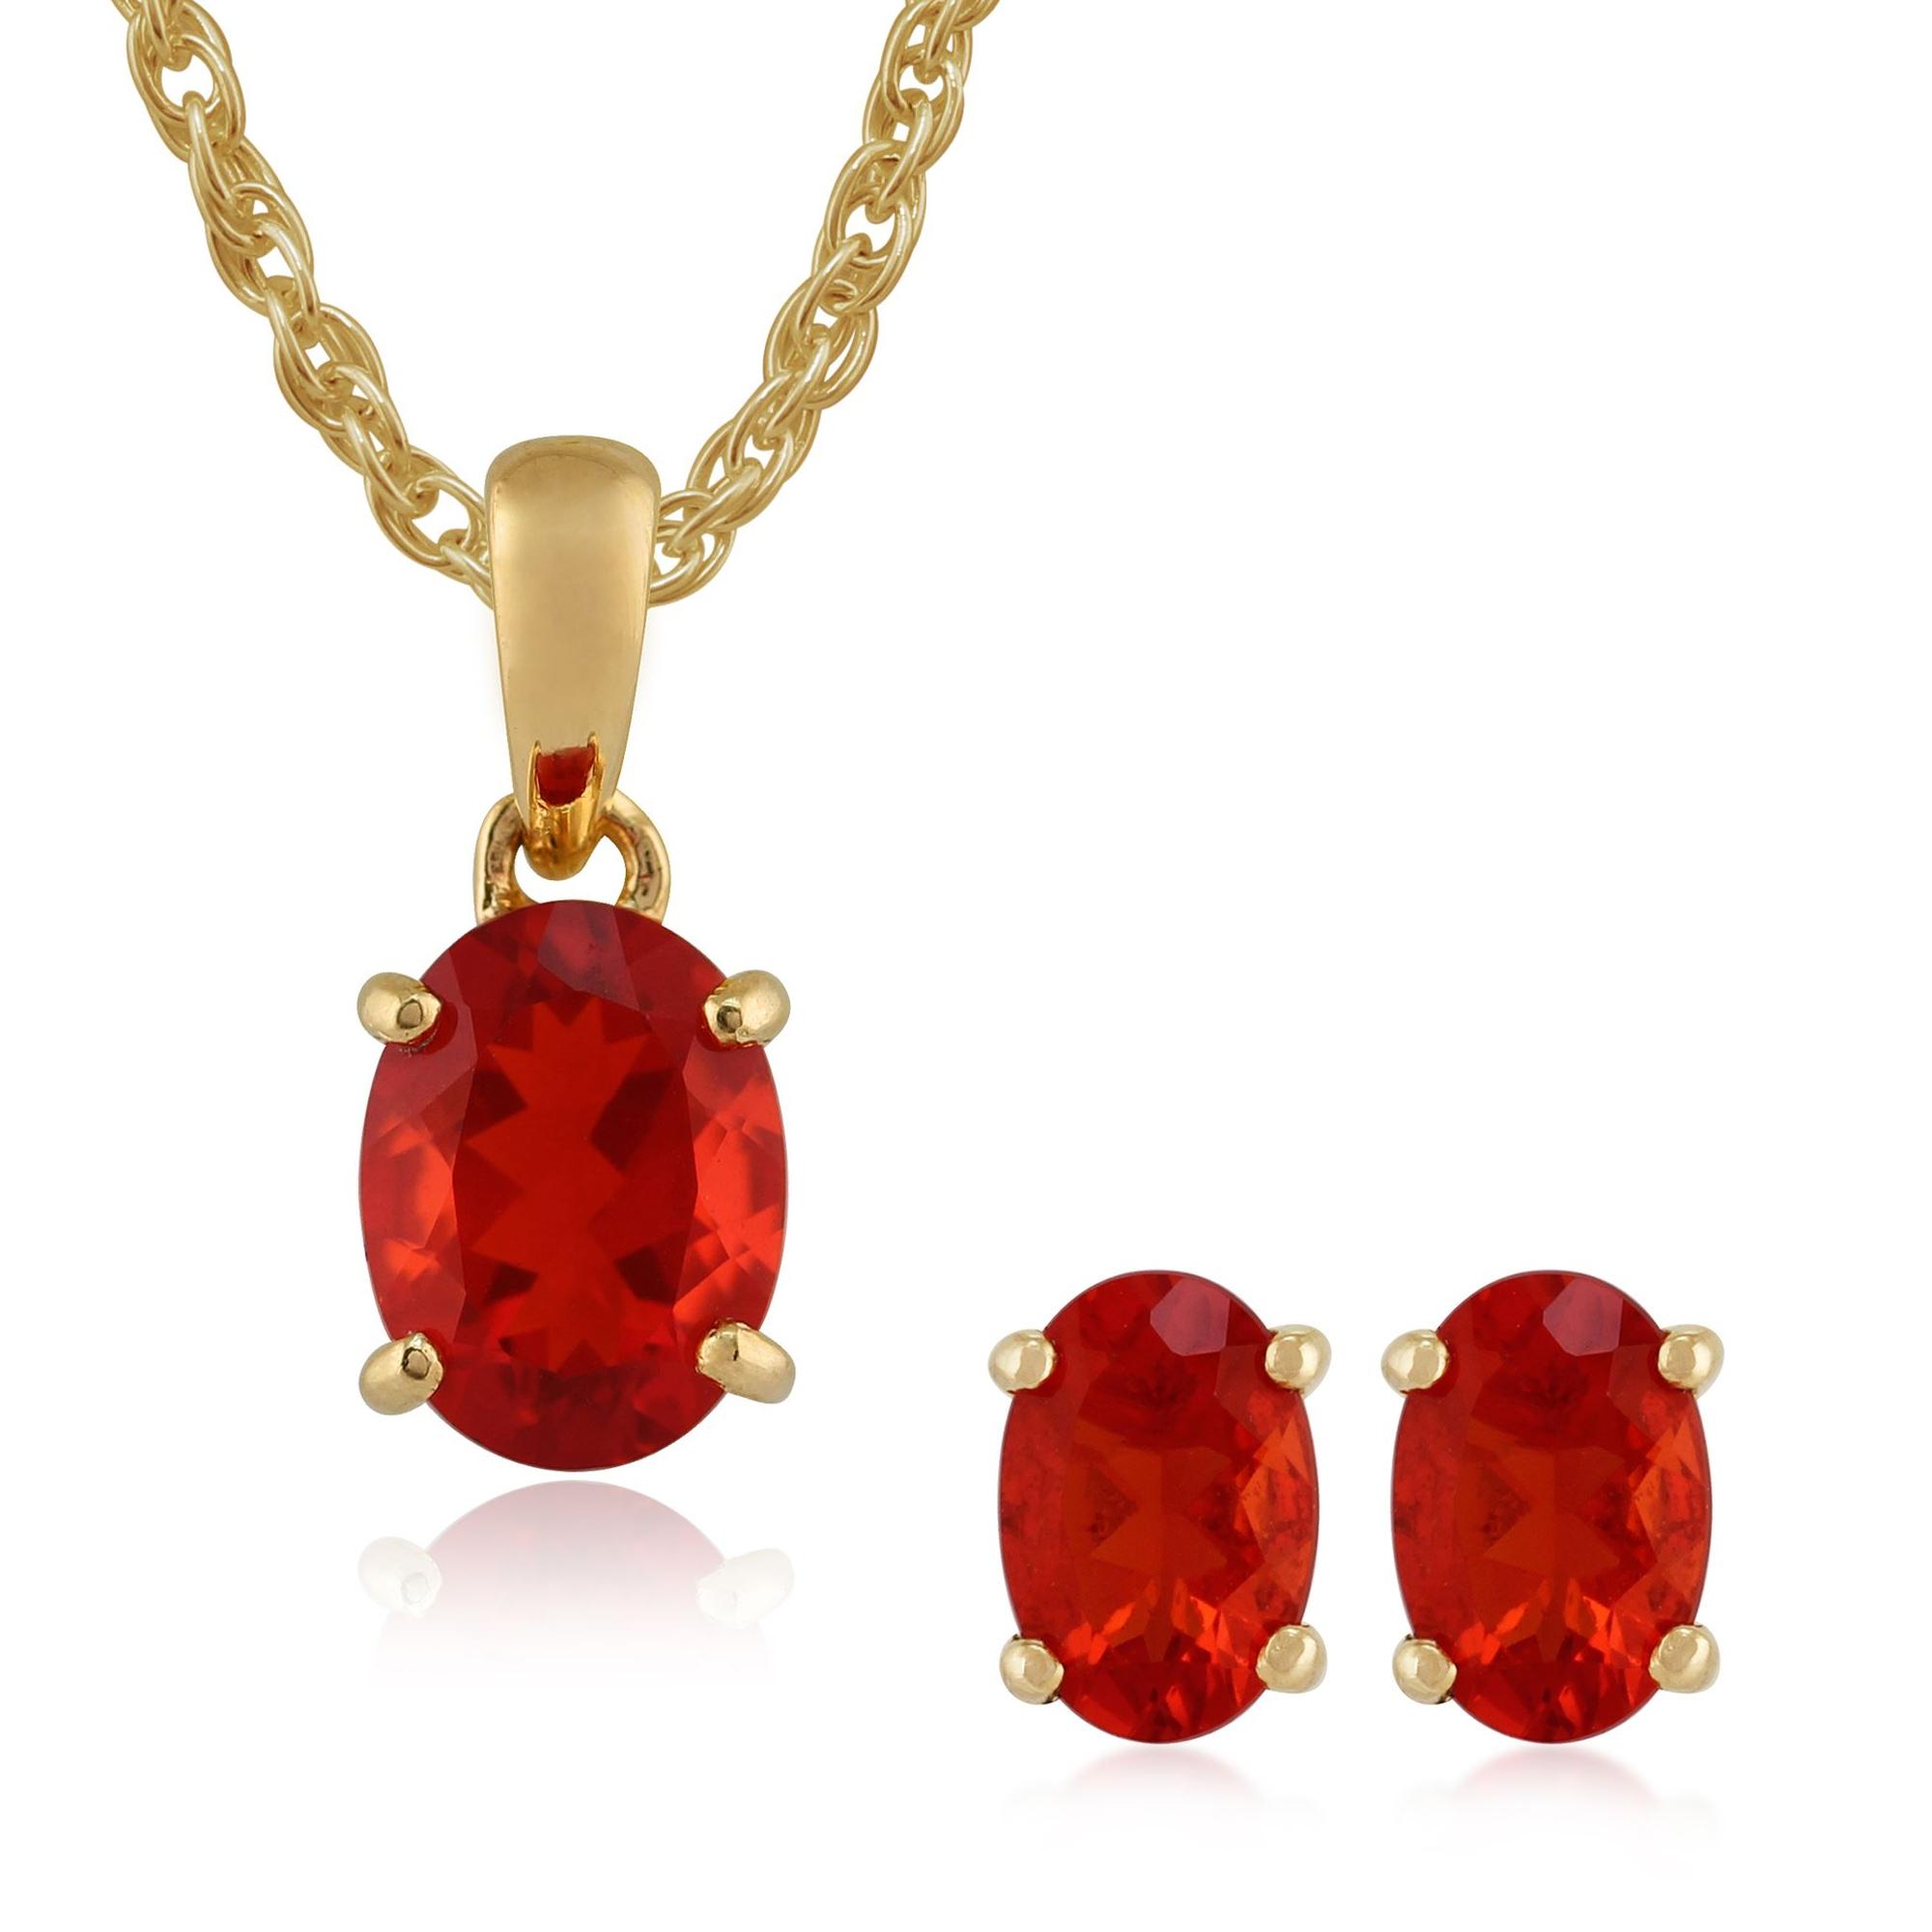 Gemondo 9ct Yellow Gold Fire Opal Oval Stud Earrings & 45cm Necklace Set